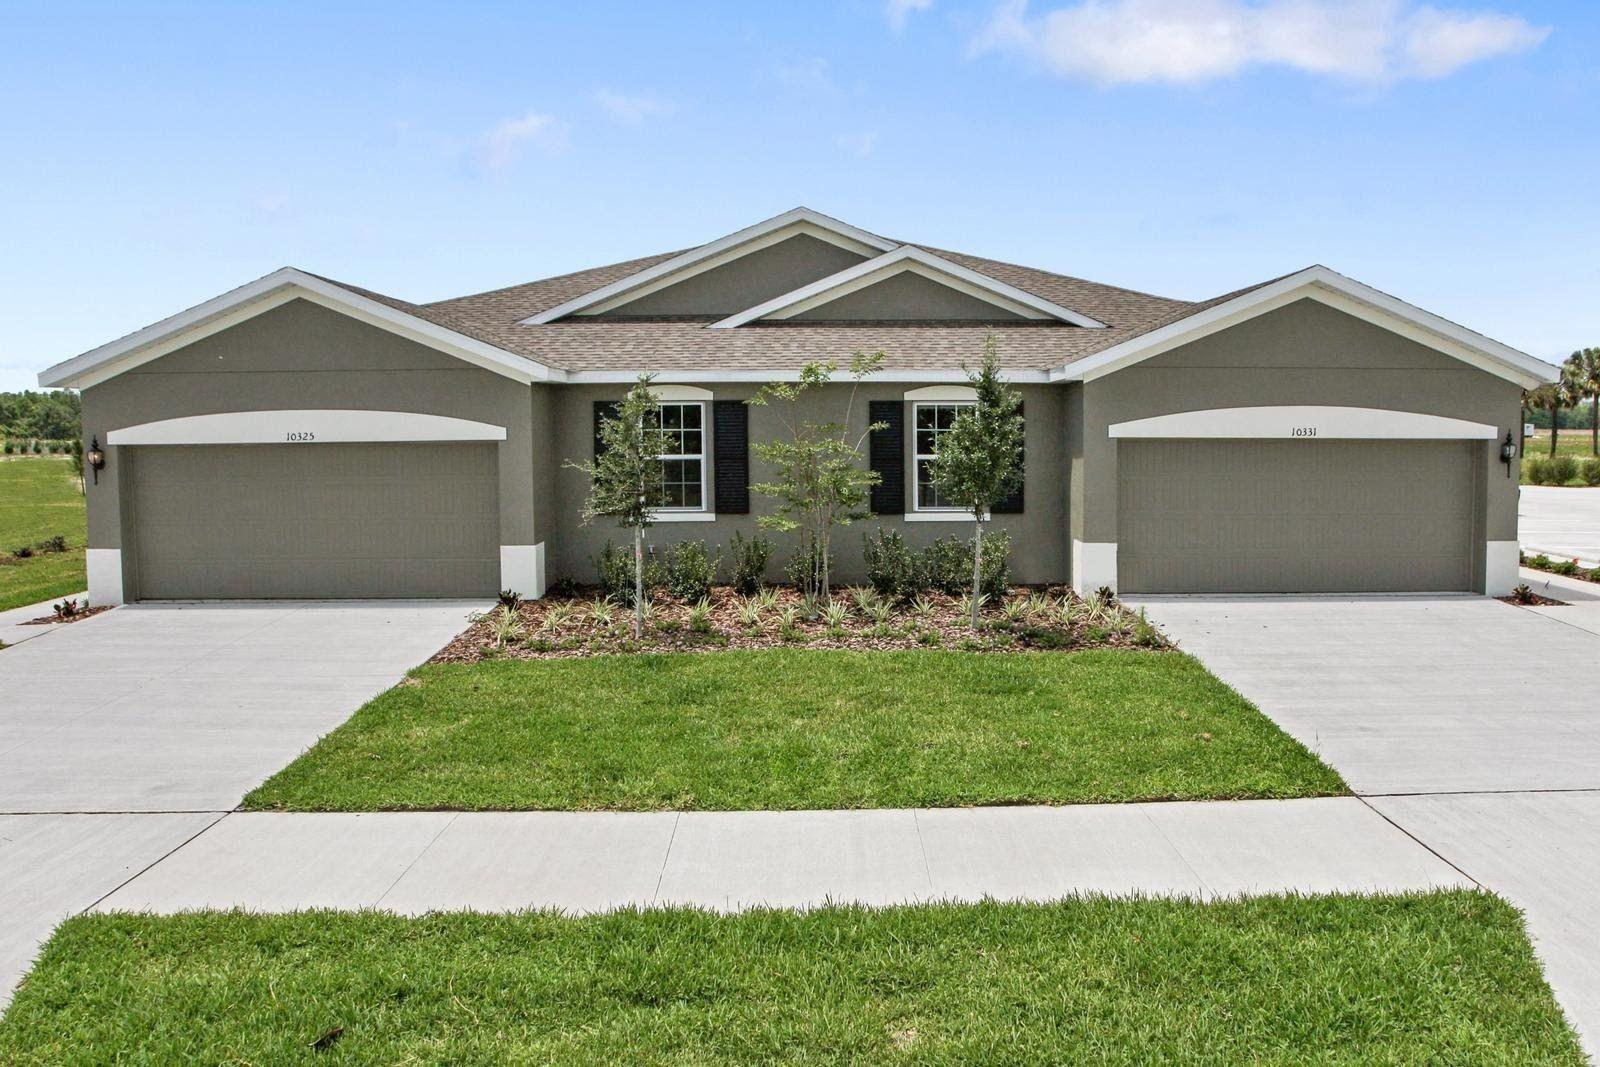 New Villas in Land O' Lakes